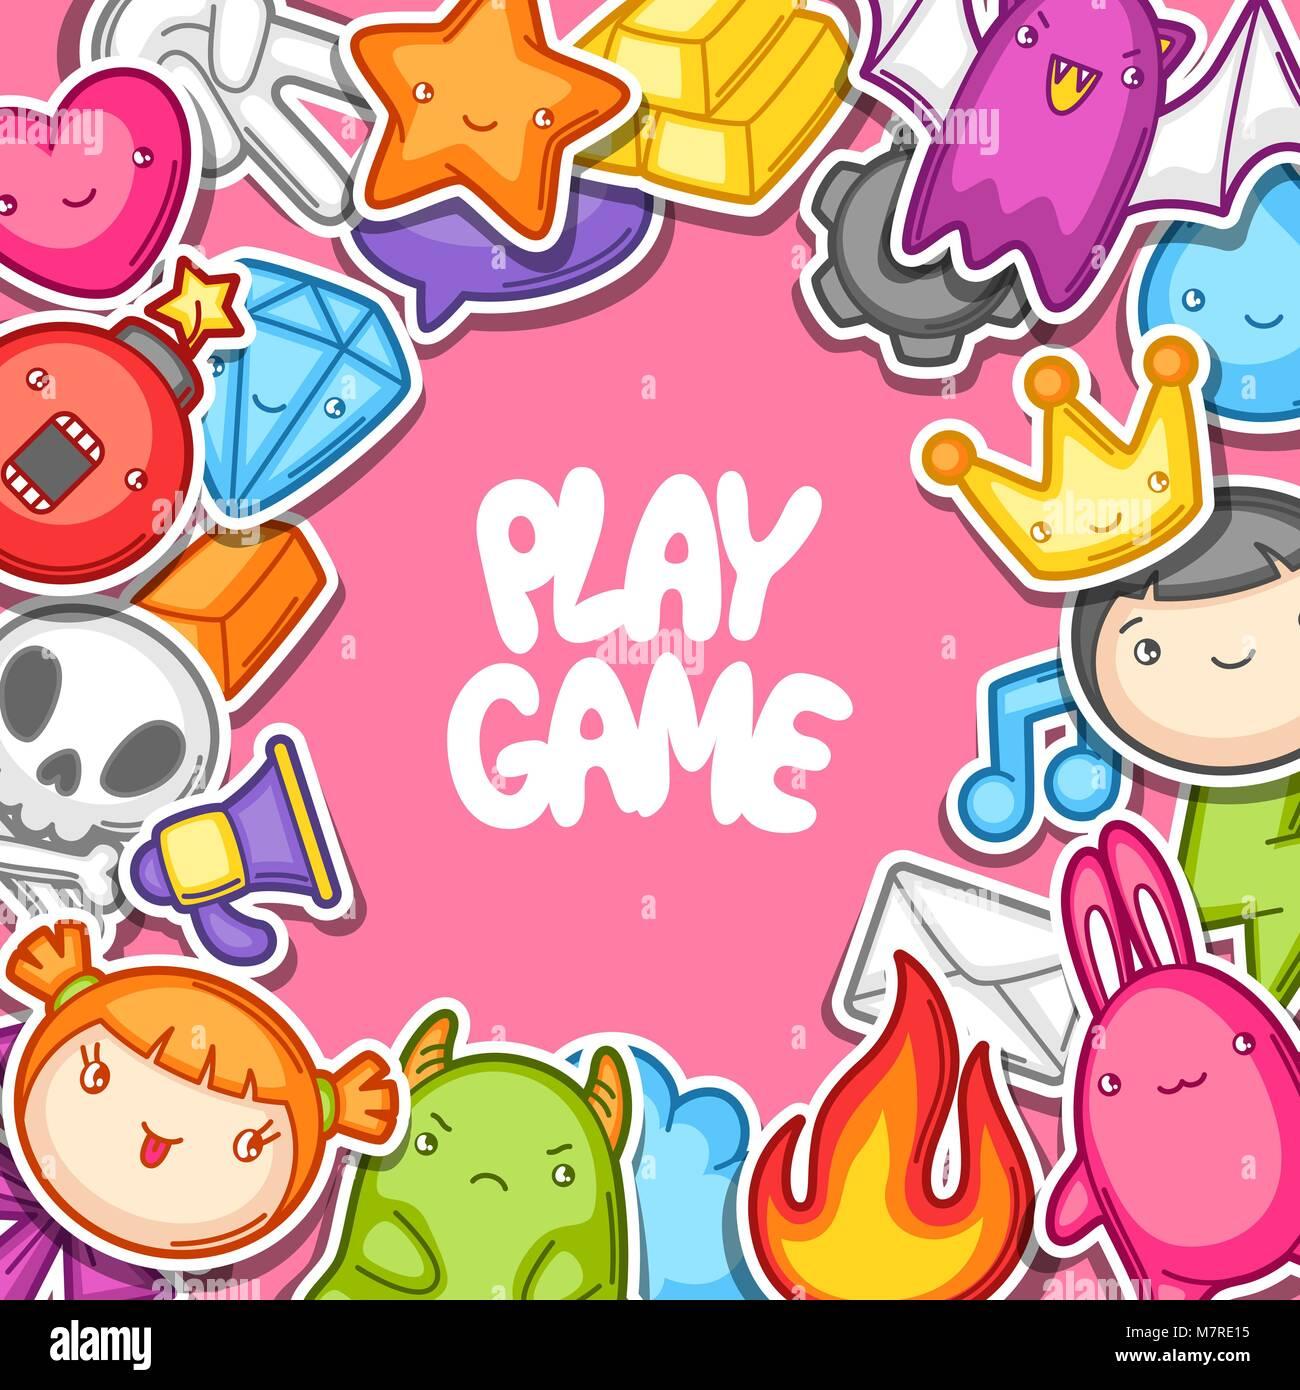 Juego Kawaii Antecedentes Elementos De Diseno De Juegos Cute